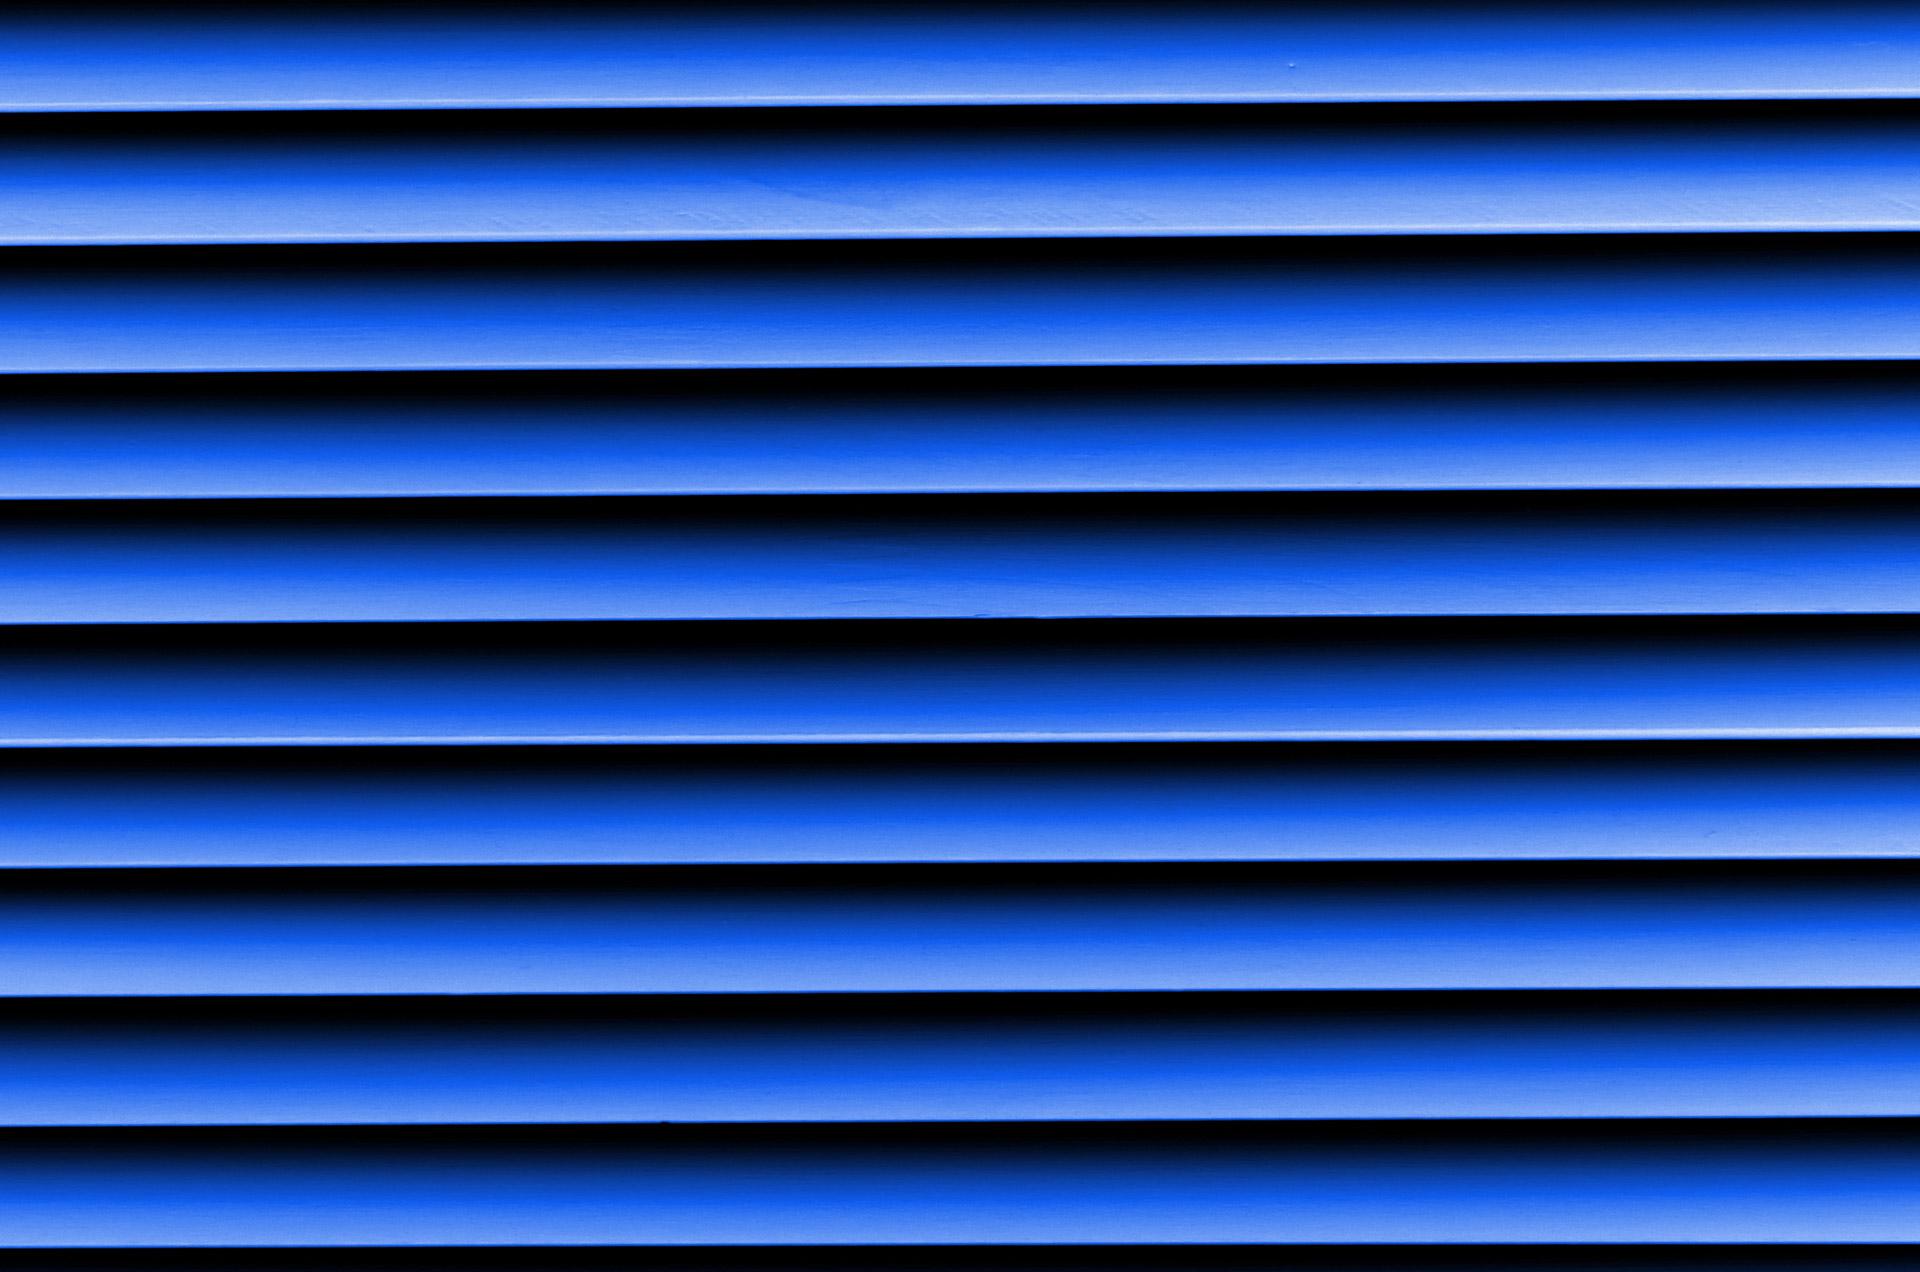 Shutterstock Wallpaper 3d Blue Lines Background Free Stock Photo Public Domain